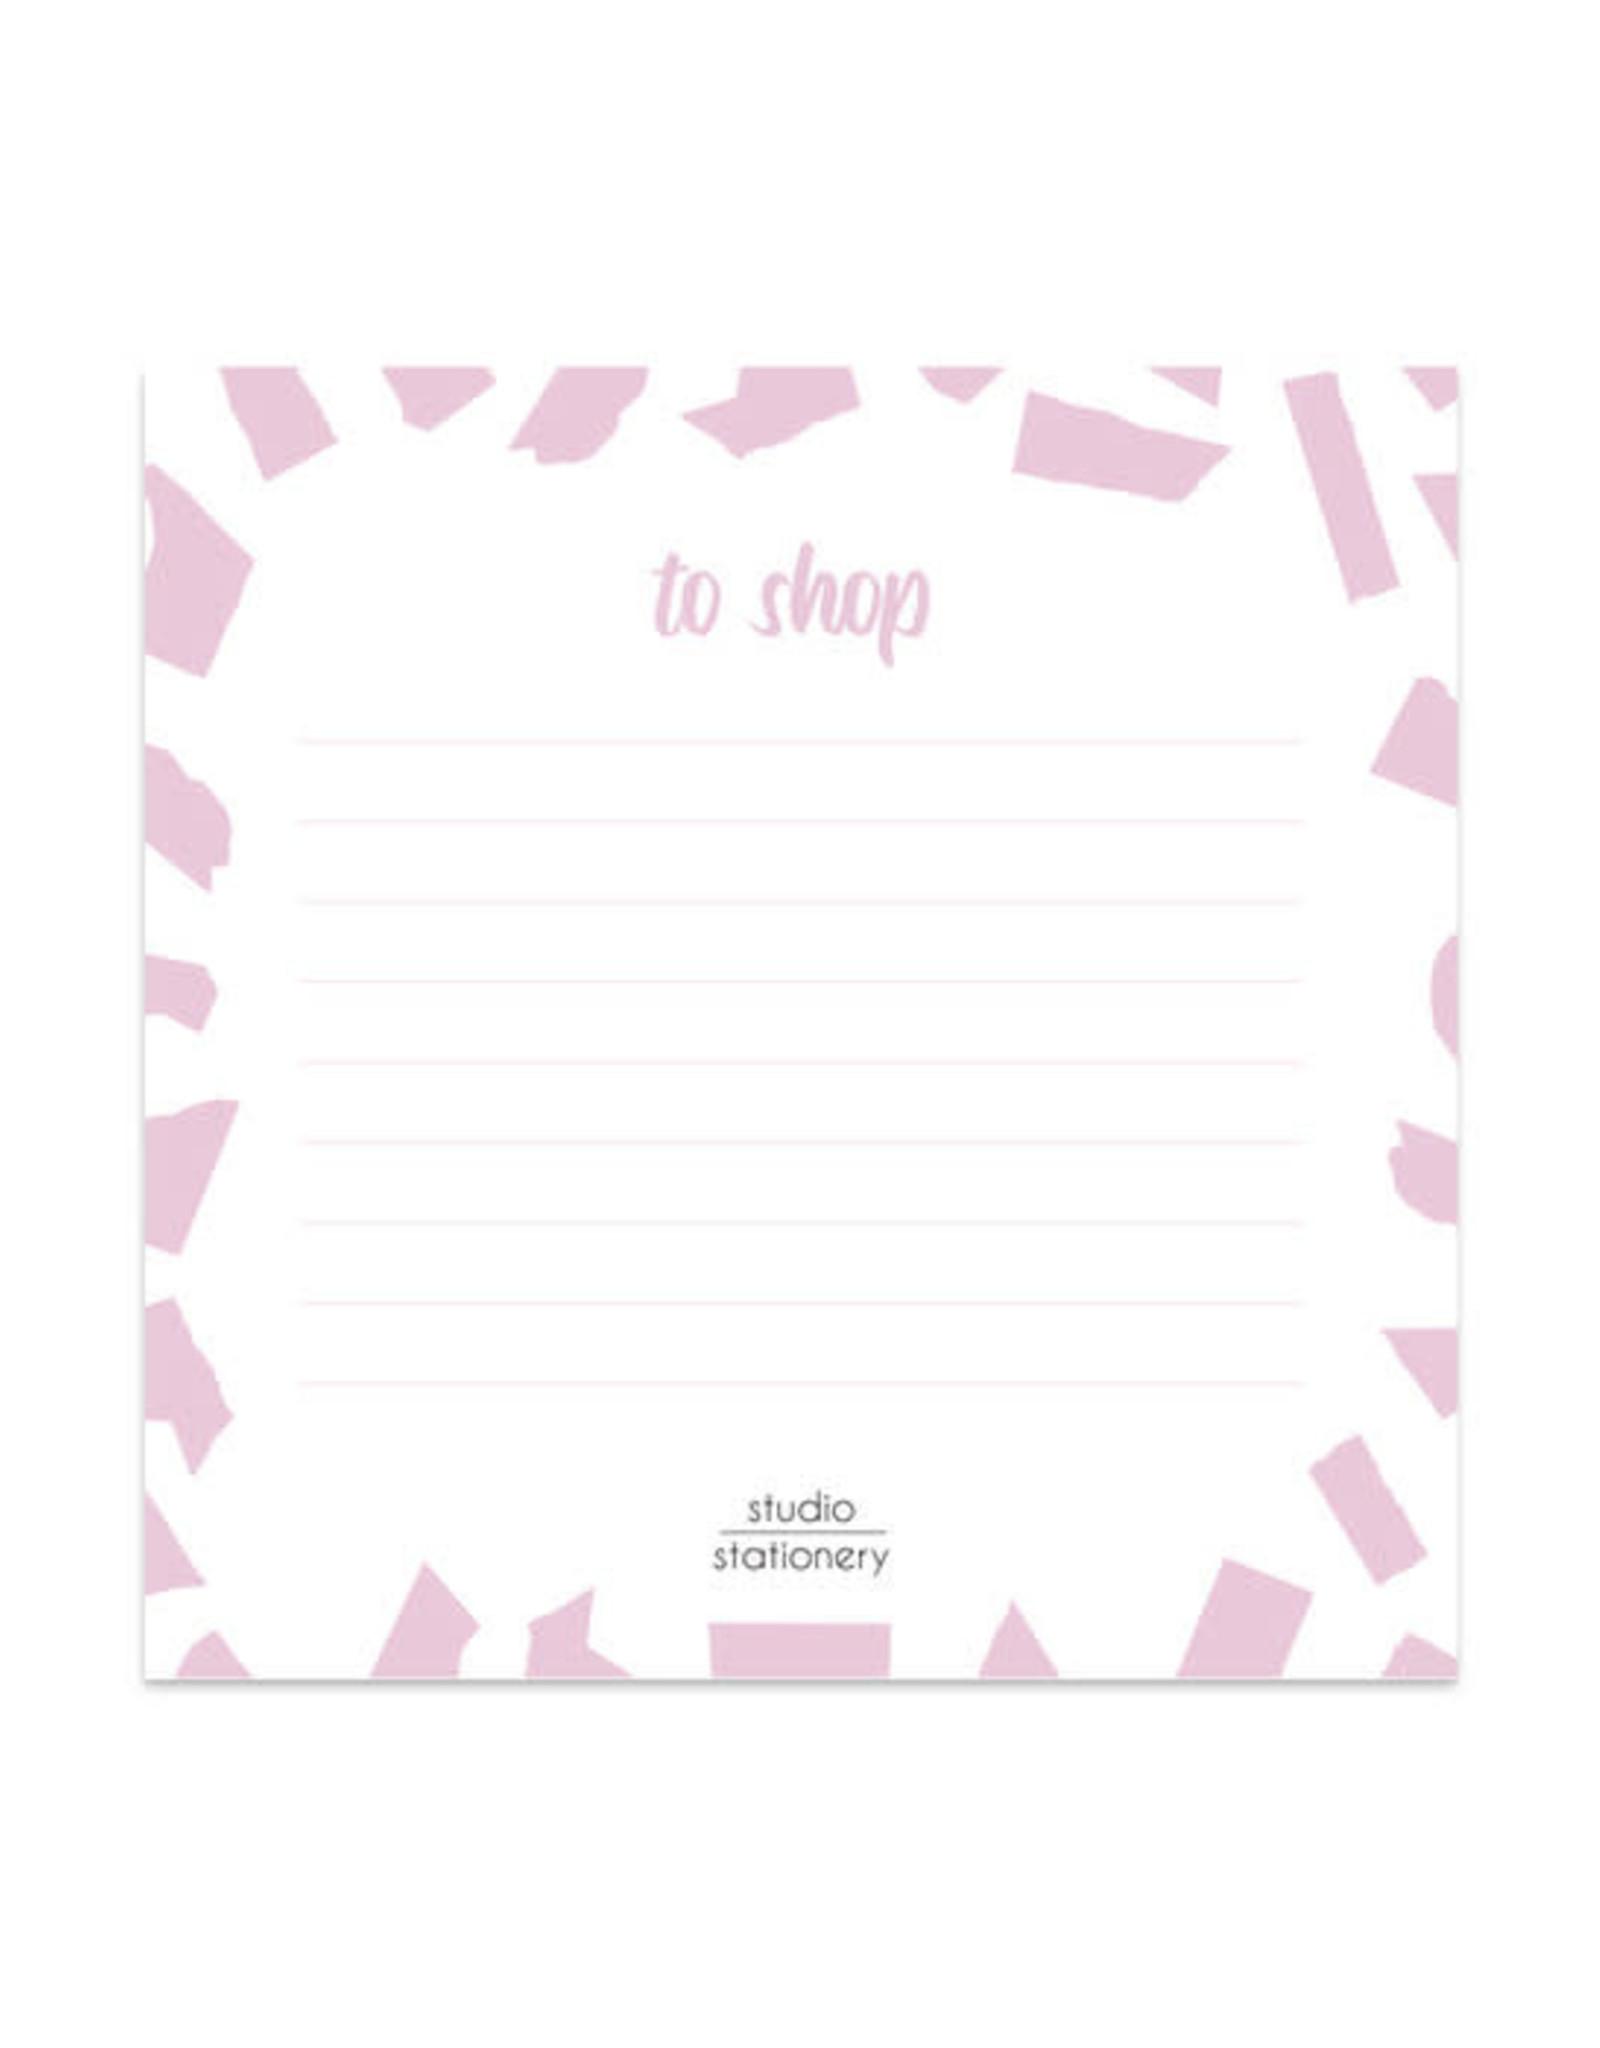 studio stationery Studio stationery Mini To Shop Pink Confetti